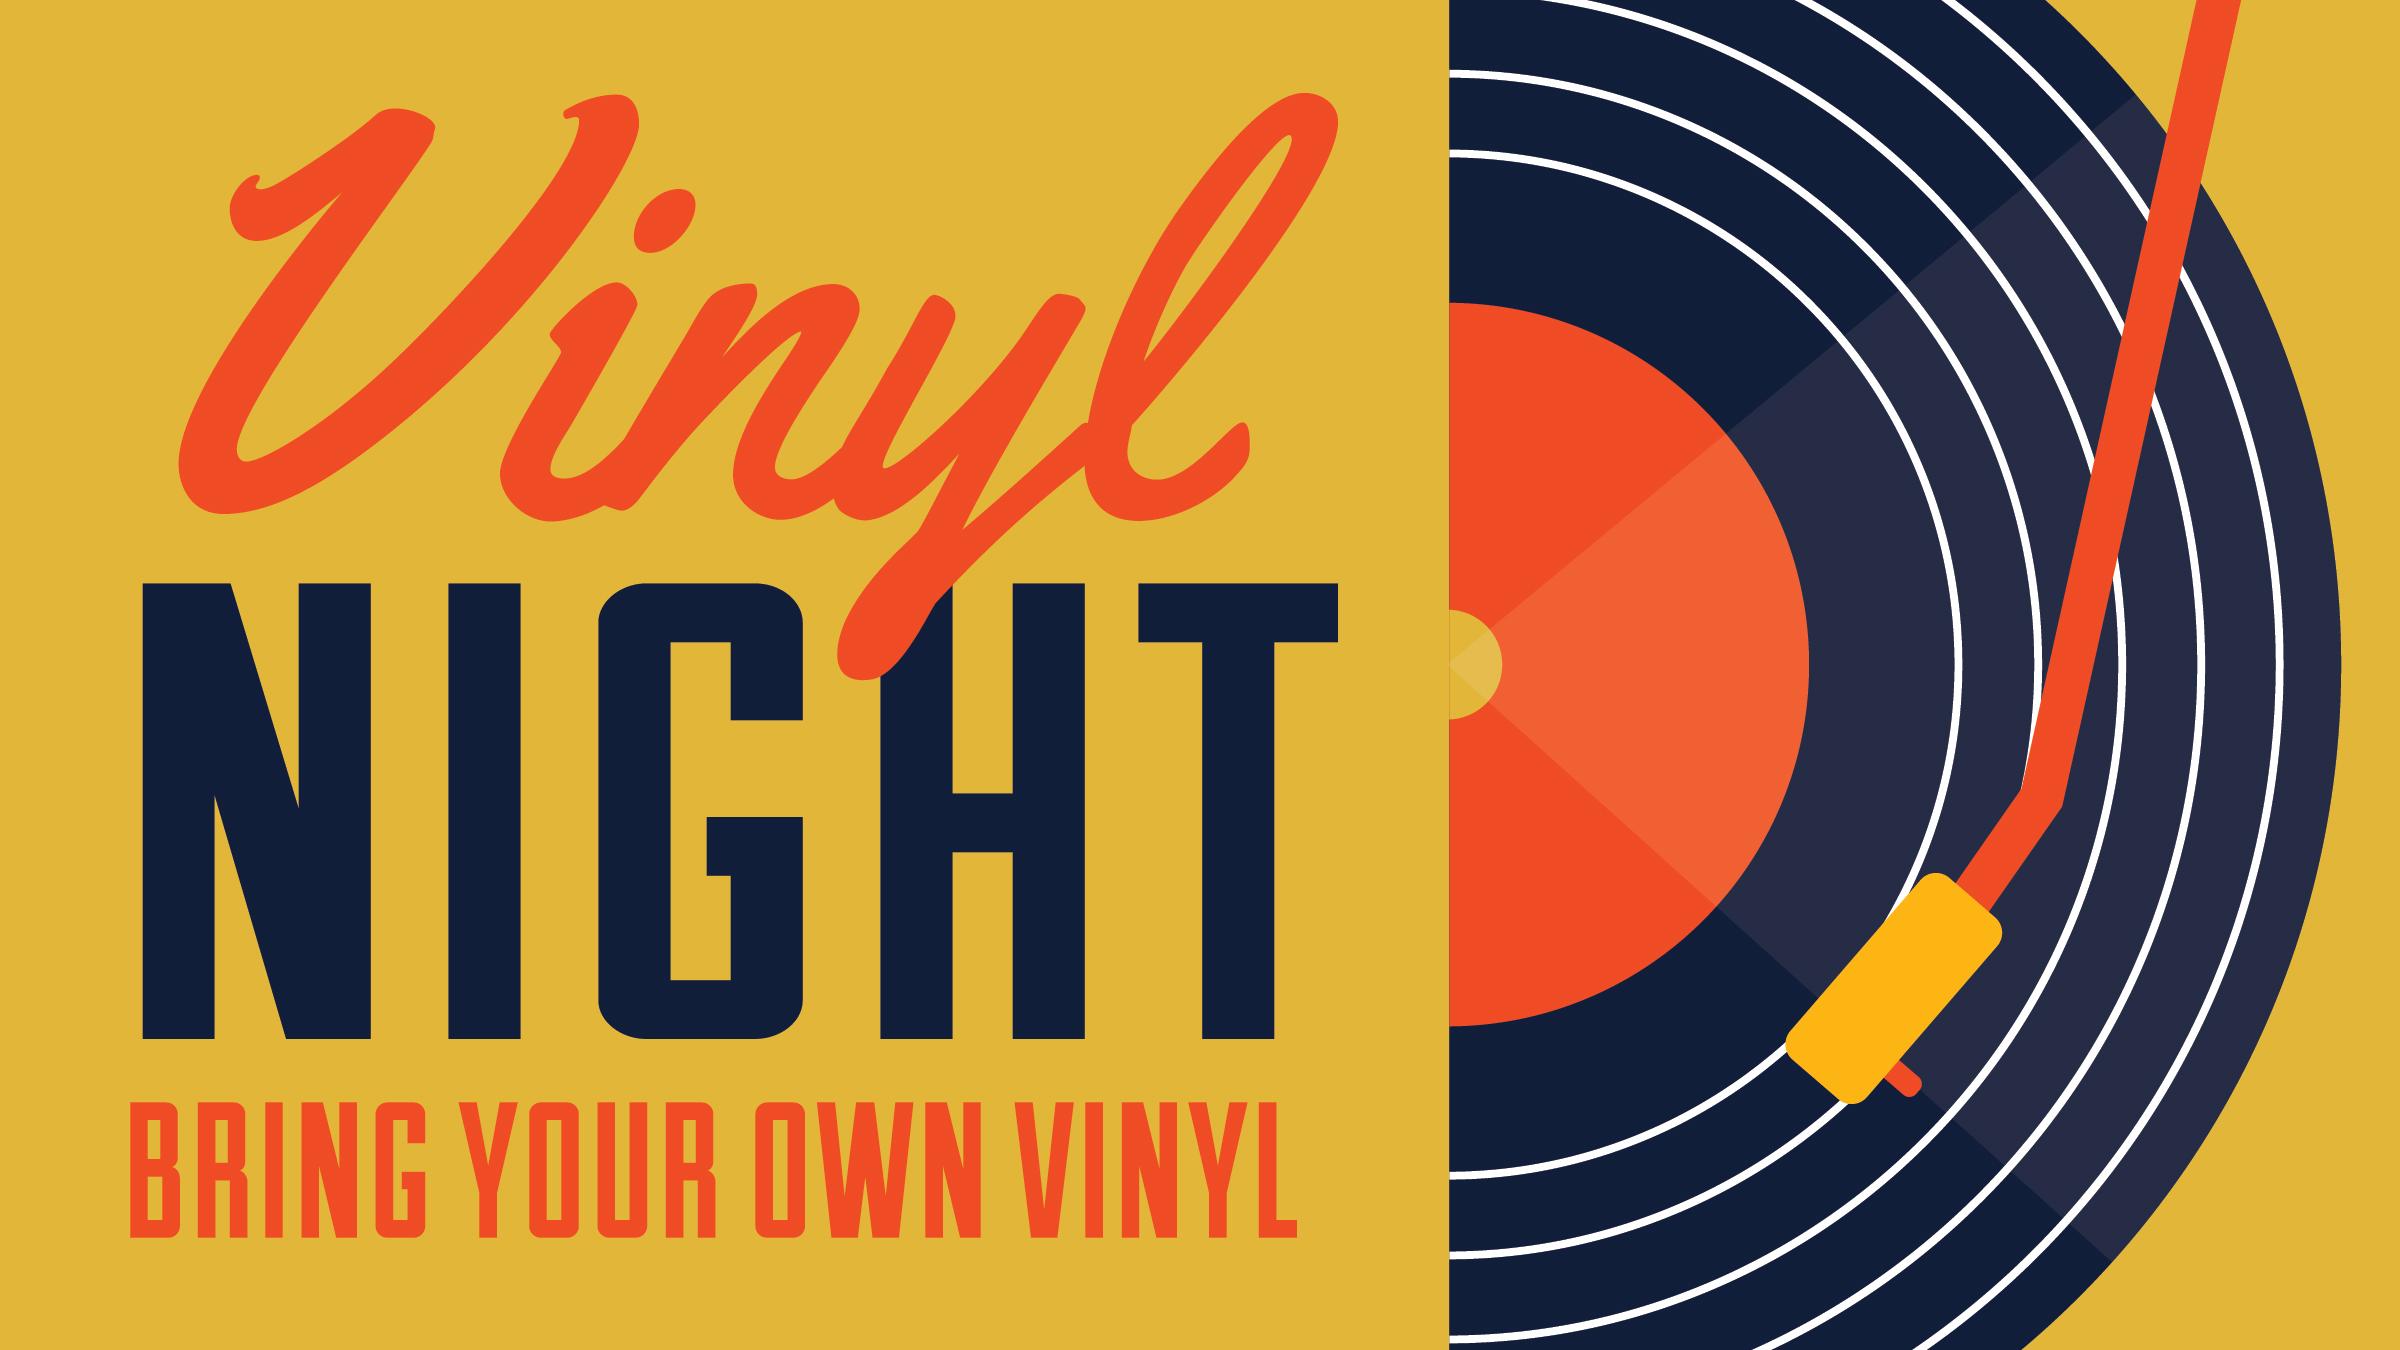 VinylNight_EVENT.jpg